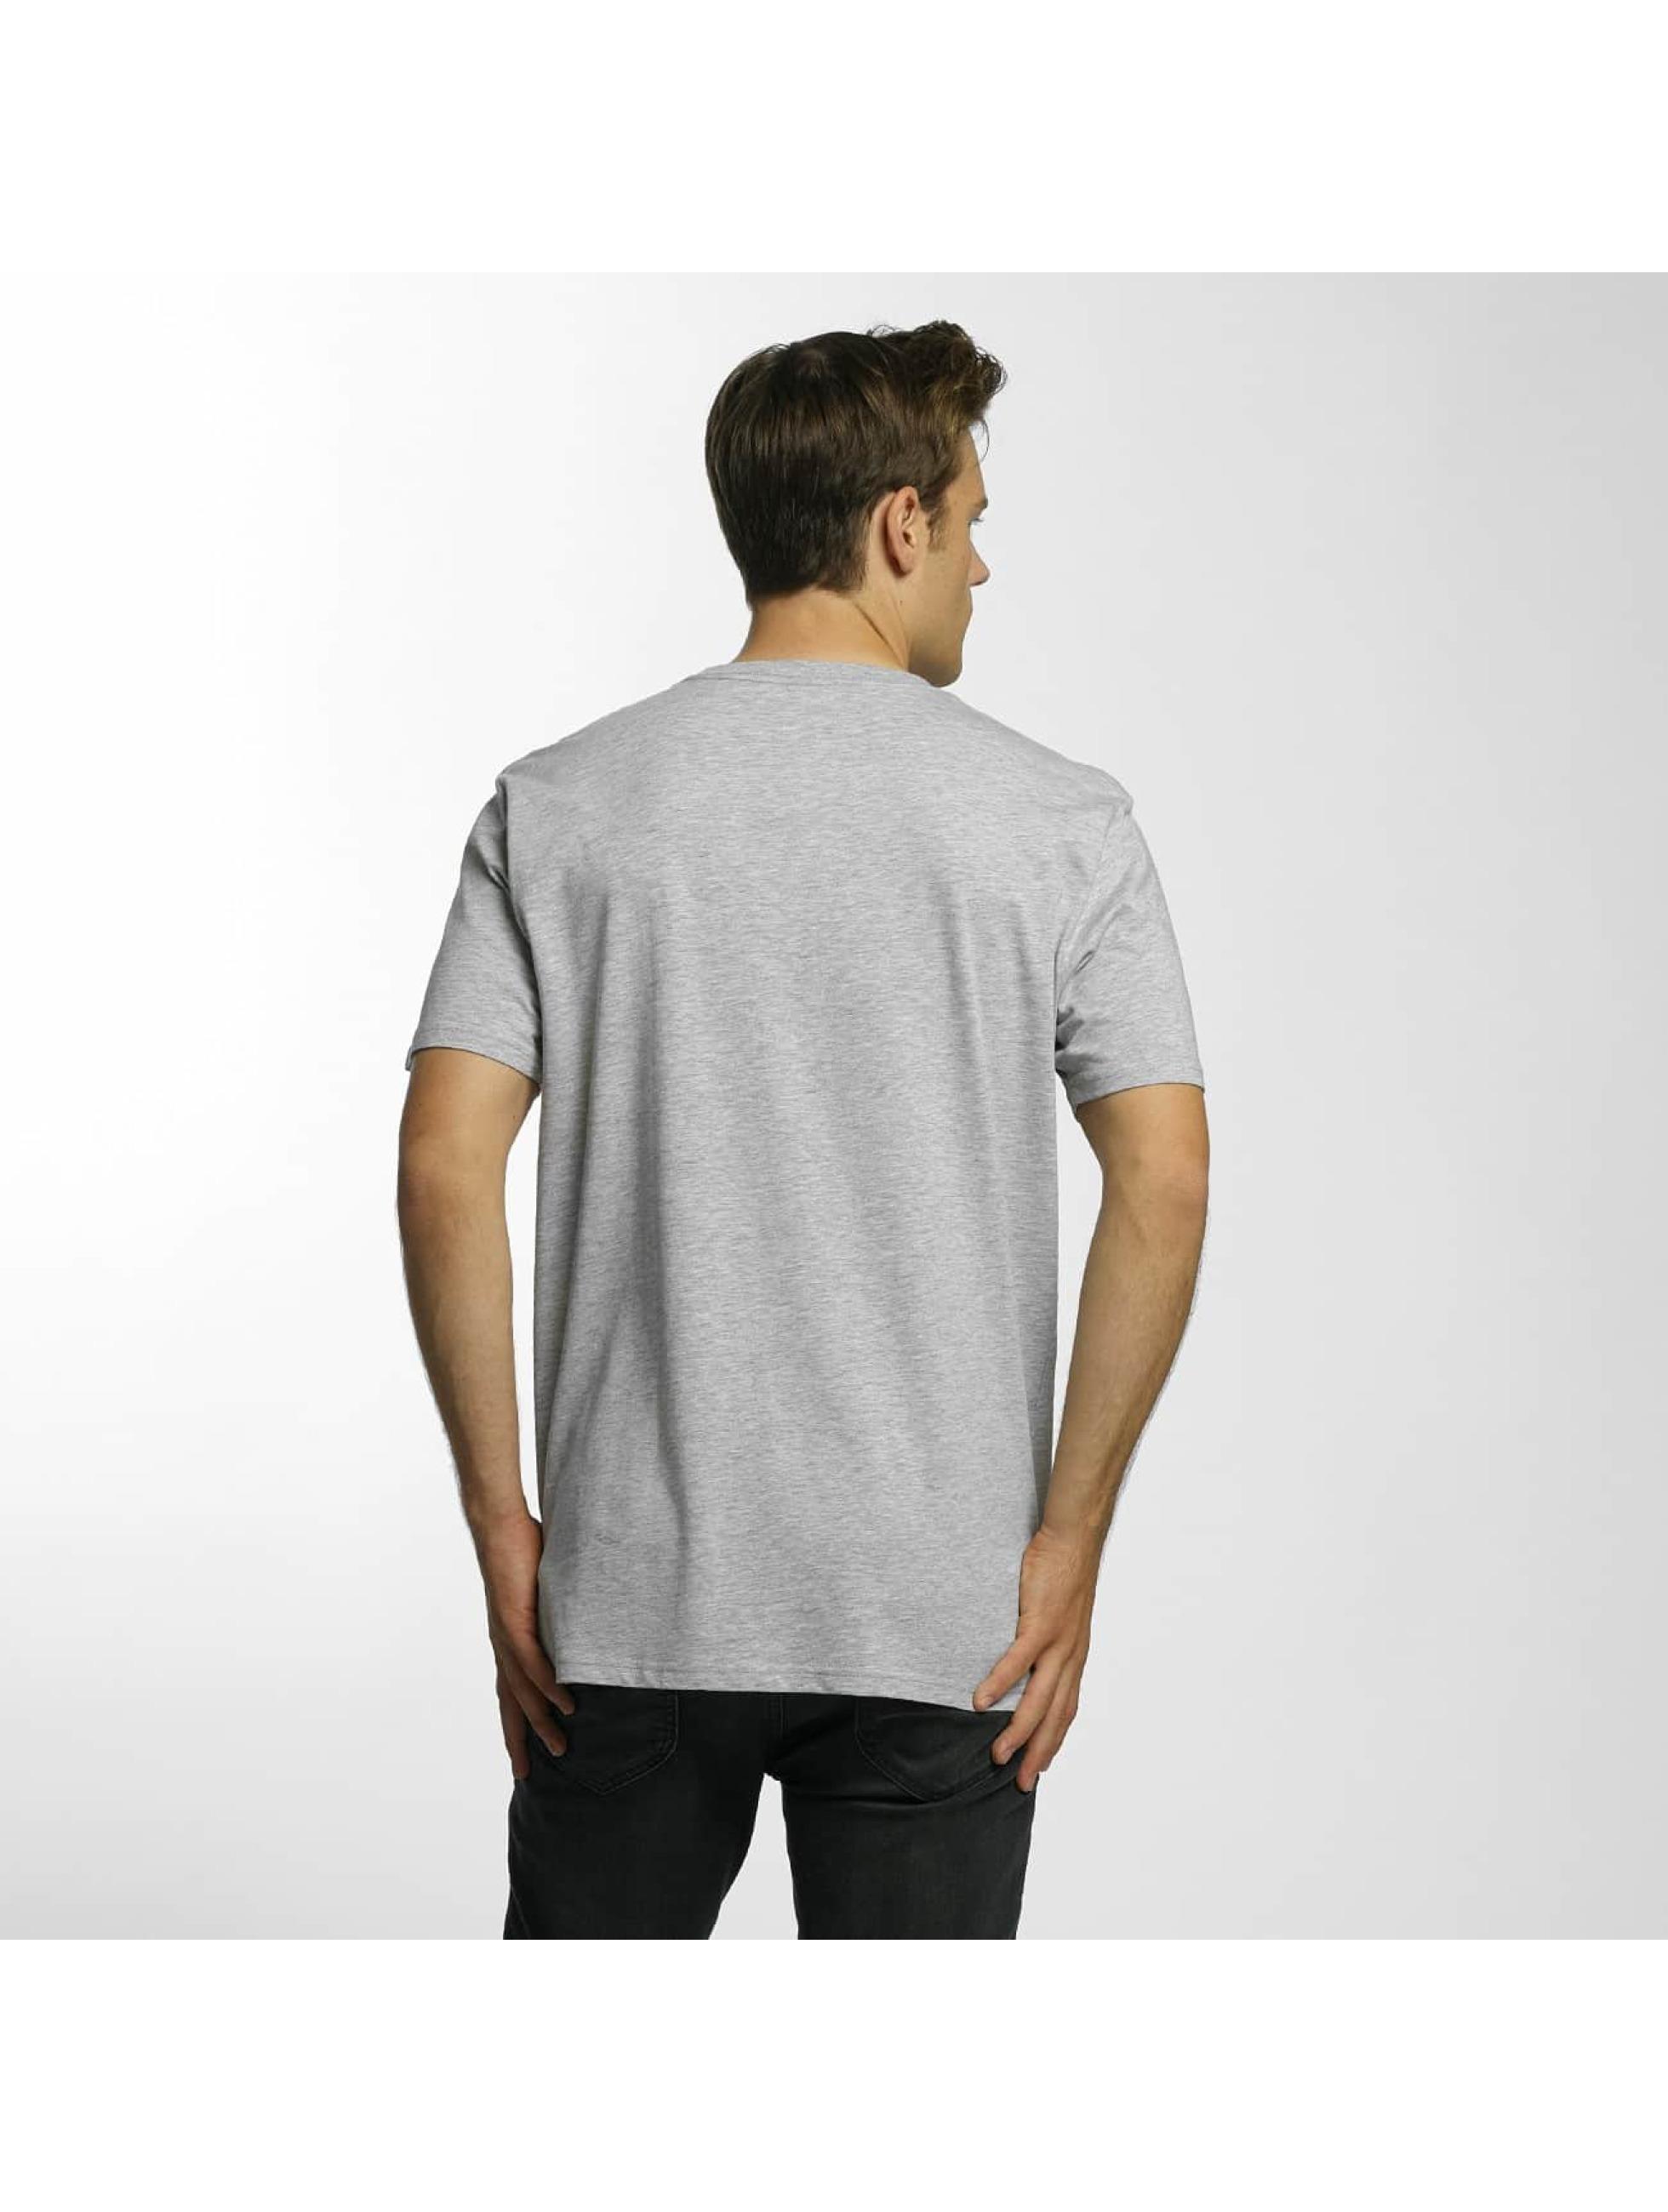 Volcom t-shirt Budy Basic grijs